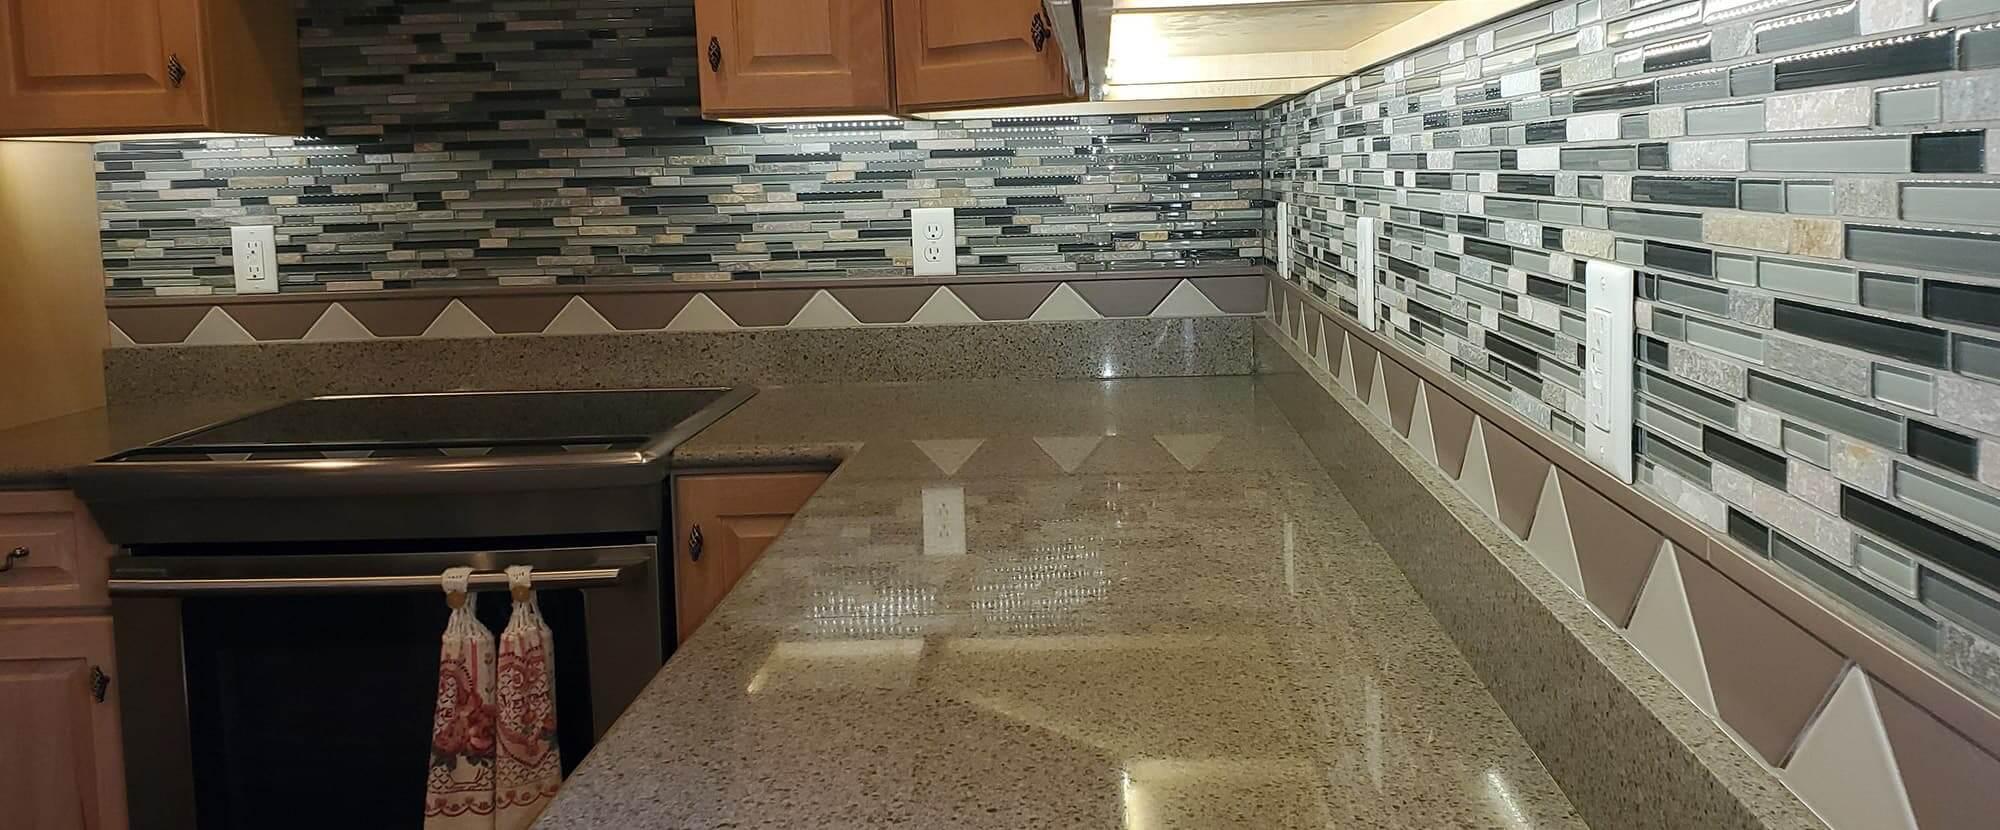 The Backsplash Company St Louis Wall Tile Backsplash Installers